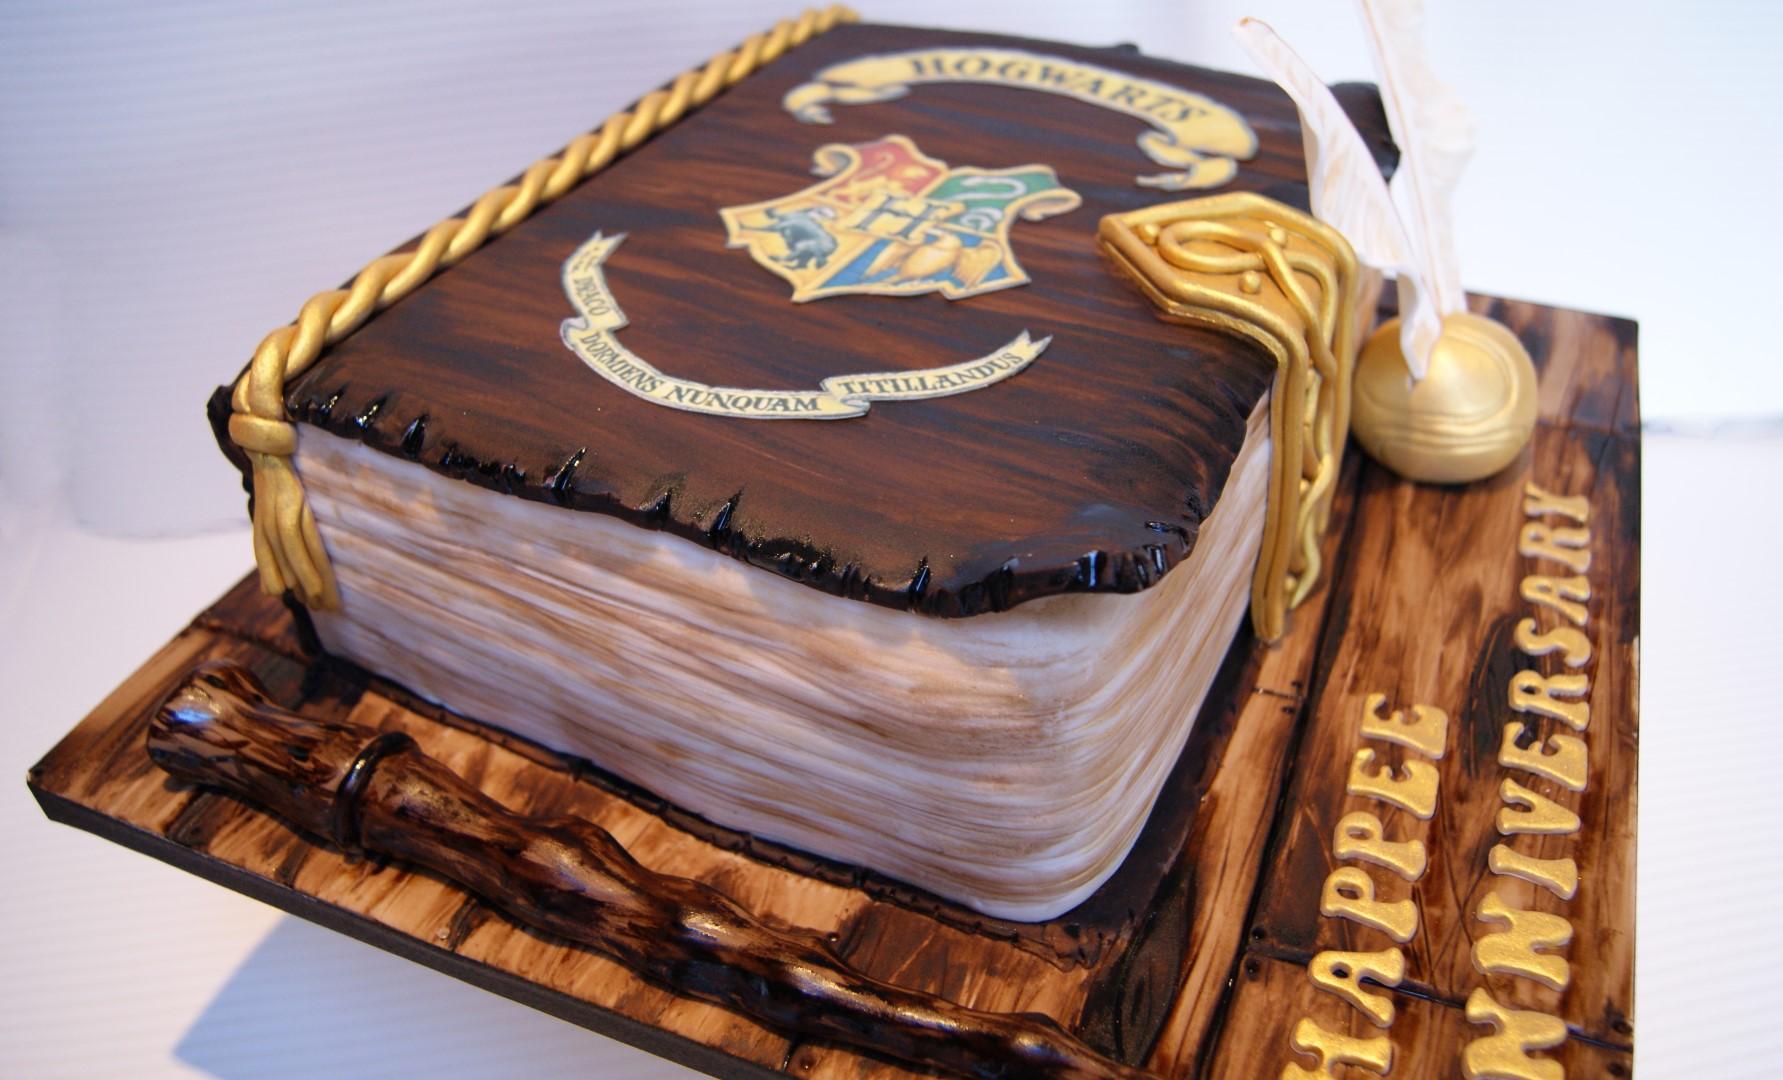 Harry Potter Book Cake : Harry potter book cake bakealous